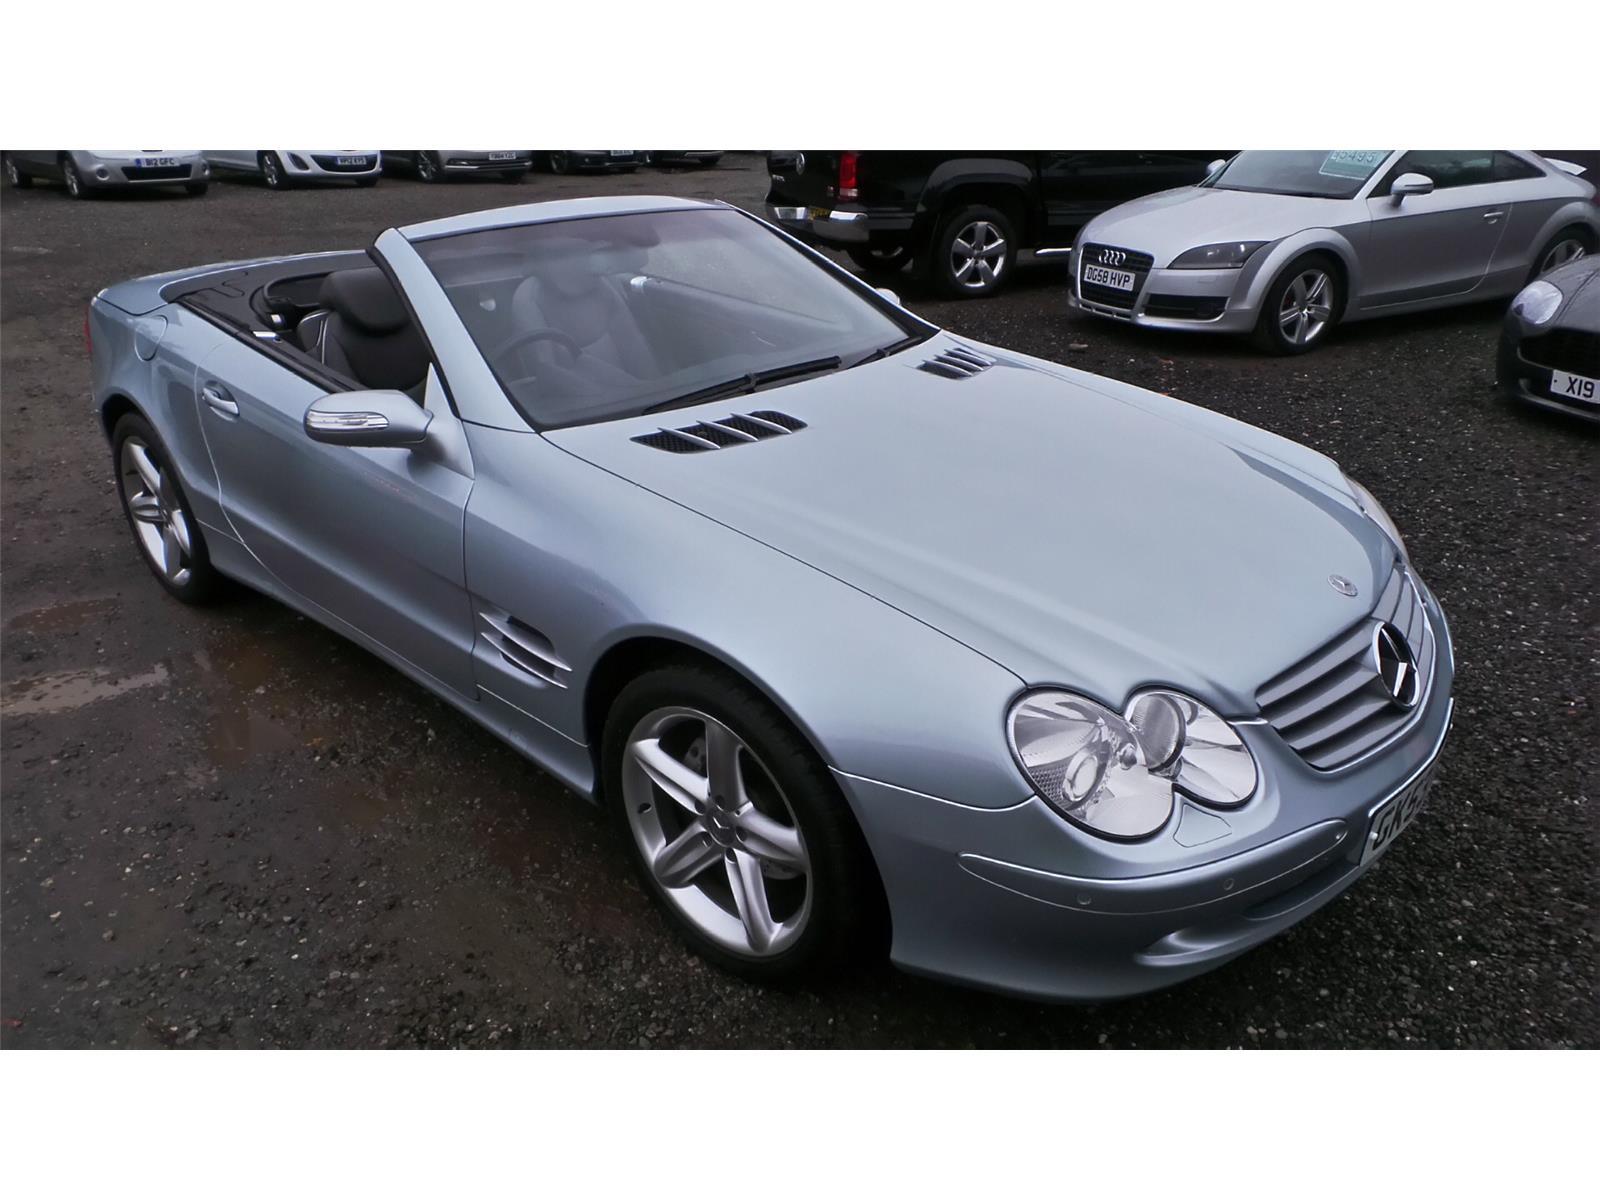 2003 Mercedes-Benz SL SL 350 3724 Petrol Automatic 5 Speed 2 Door Cabriolet